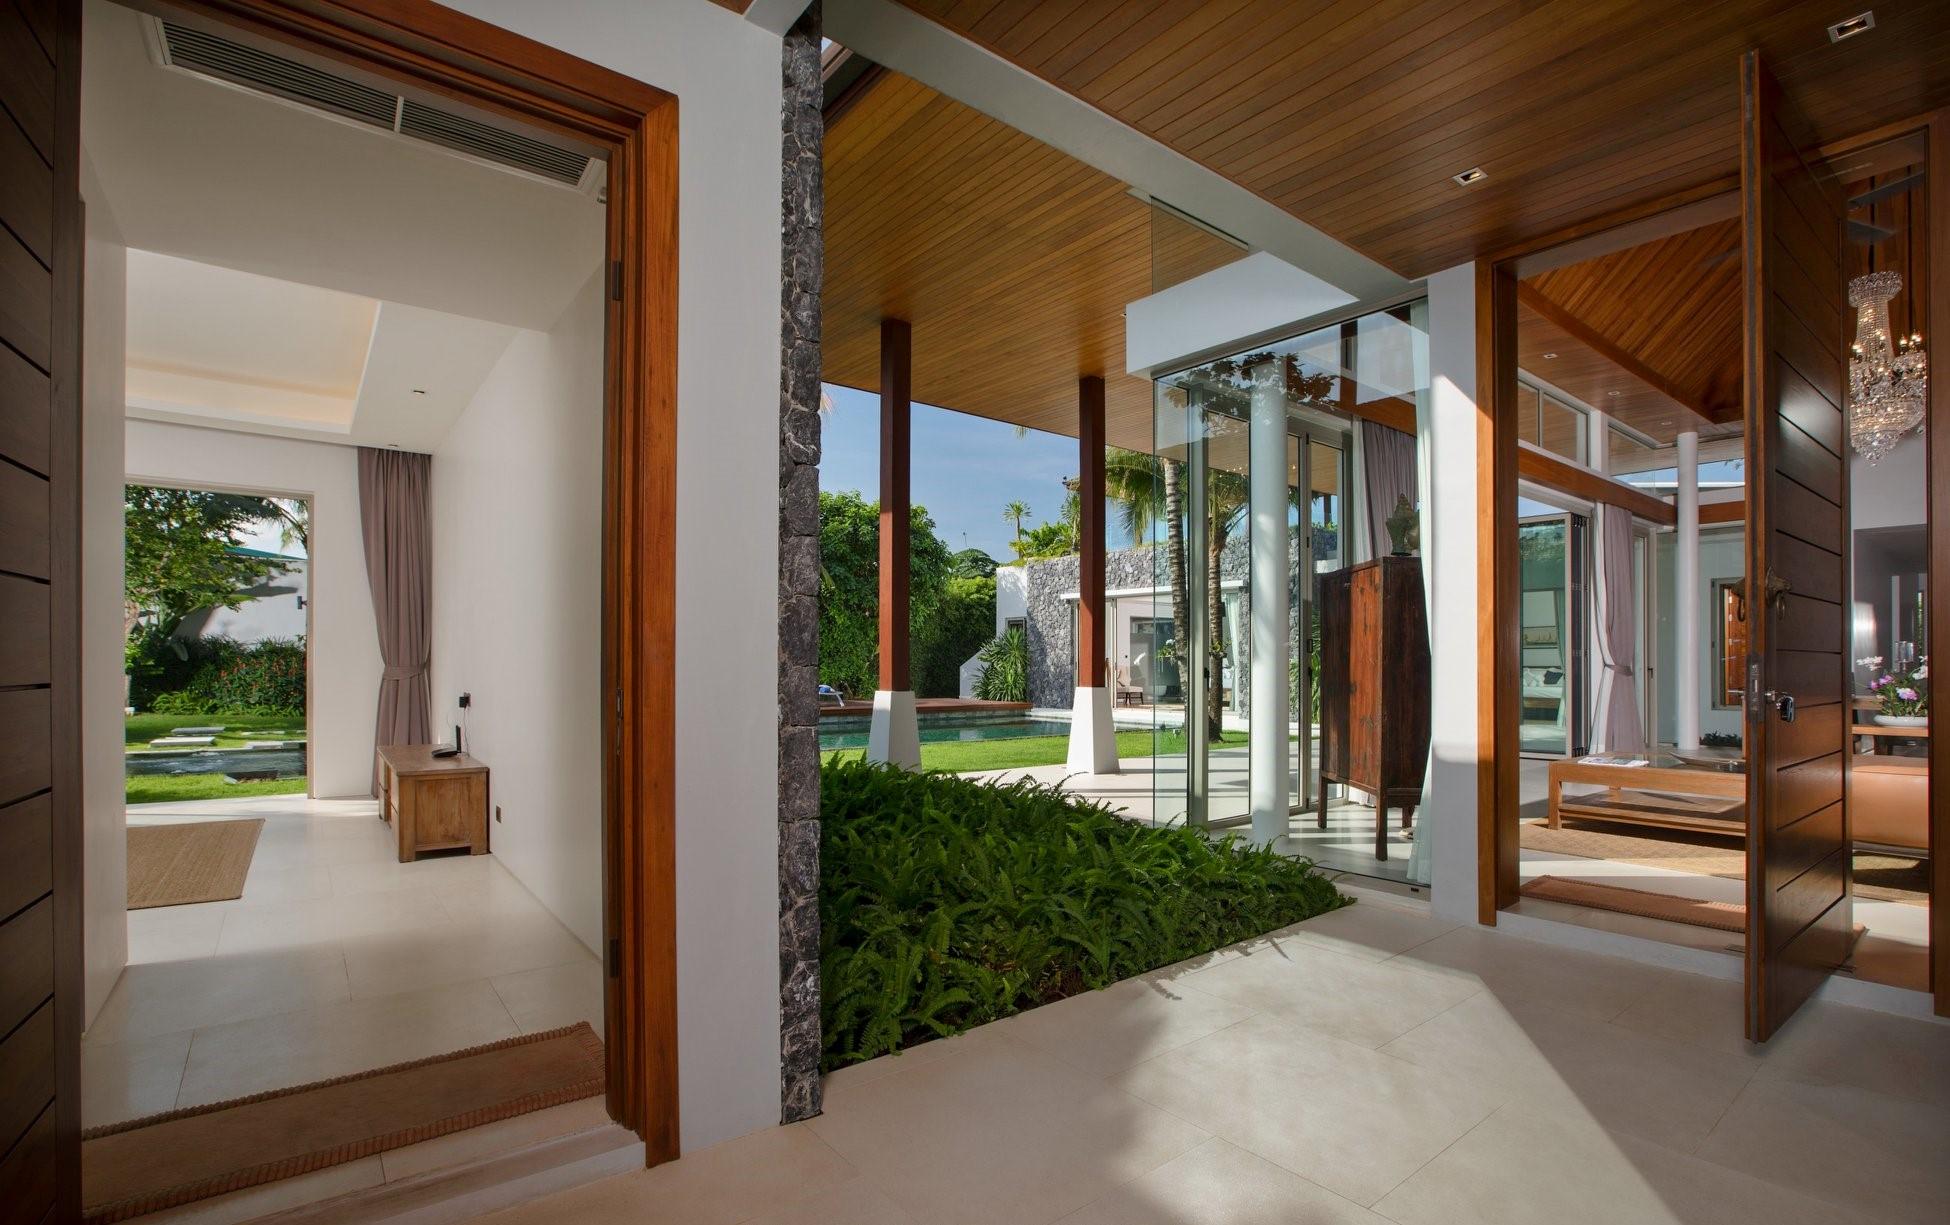 Phuket Real Eastate Agency – Laguna (1)